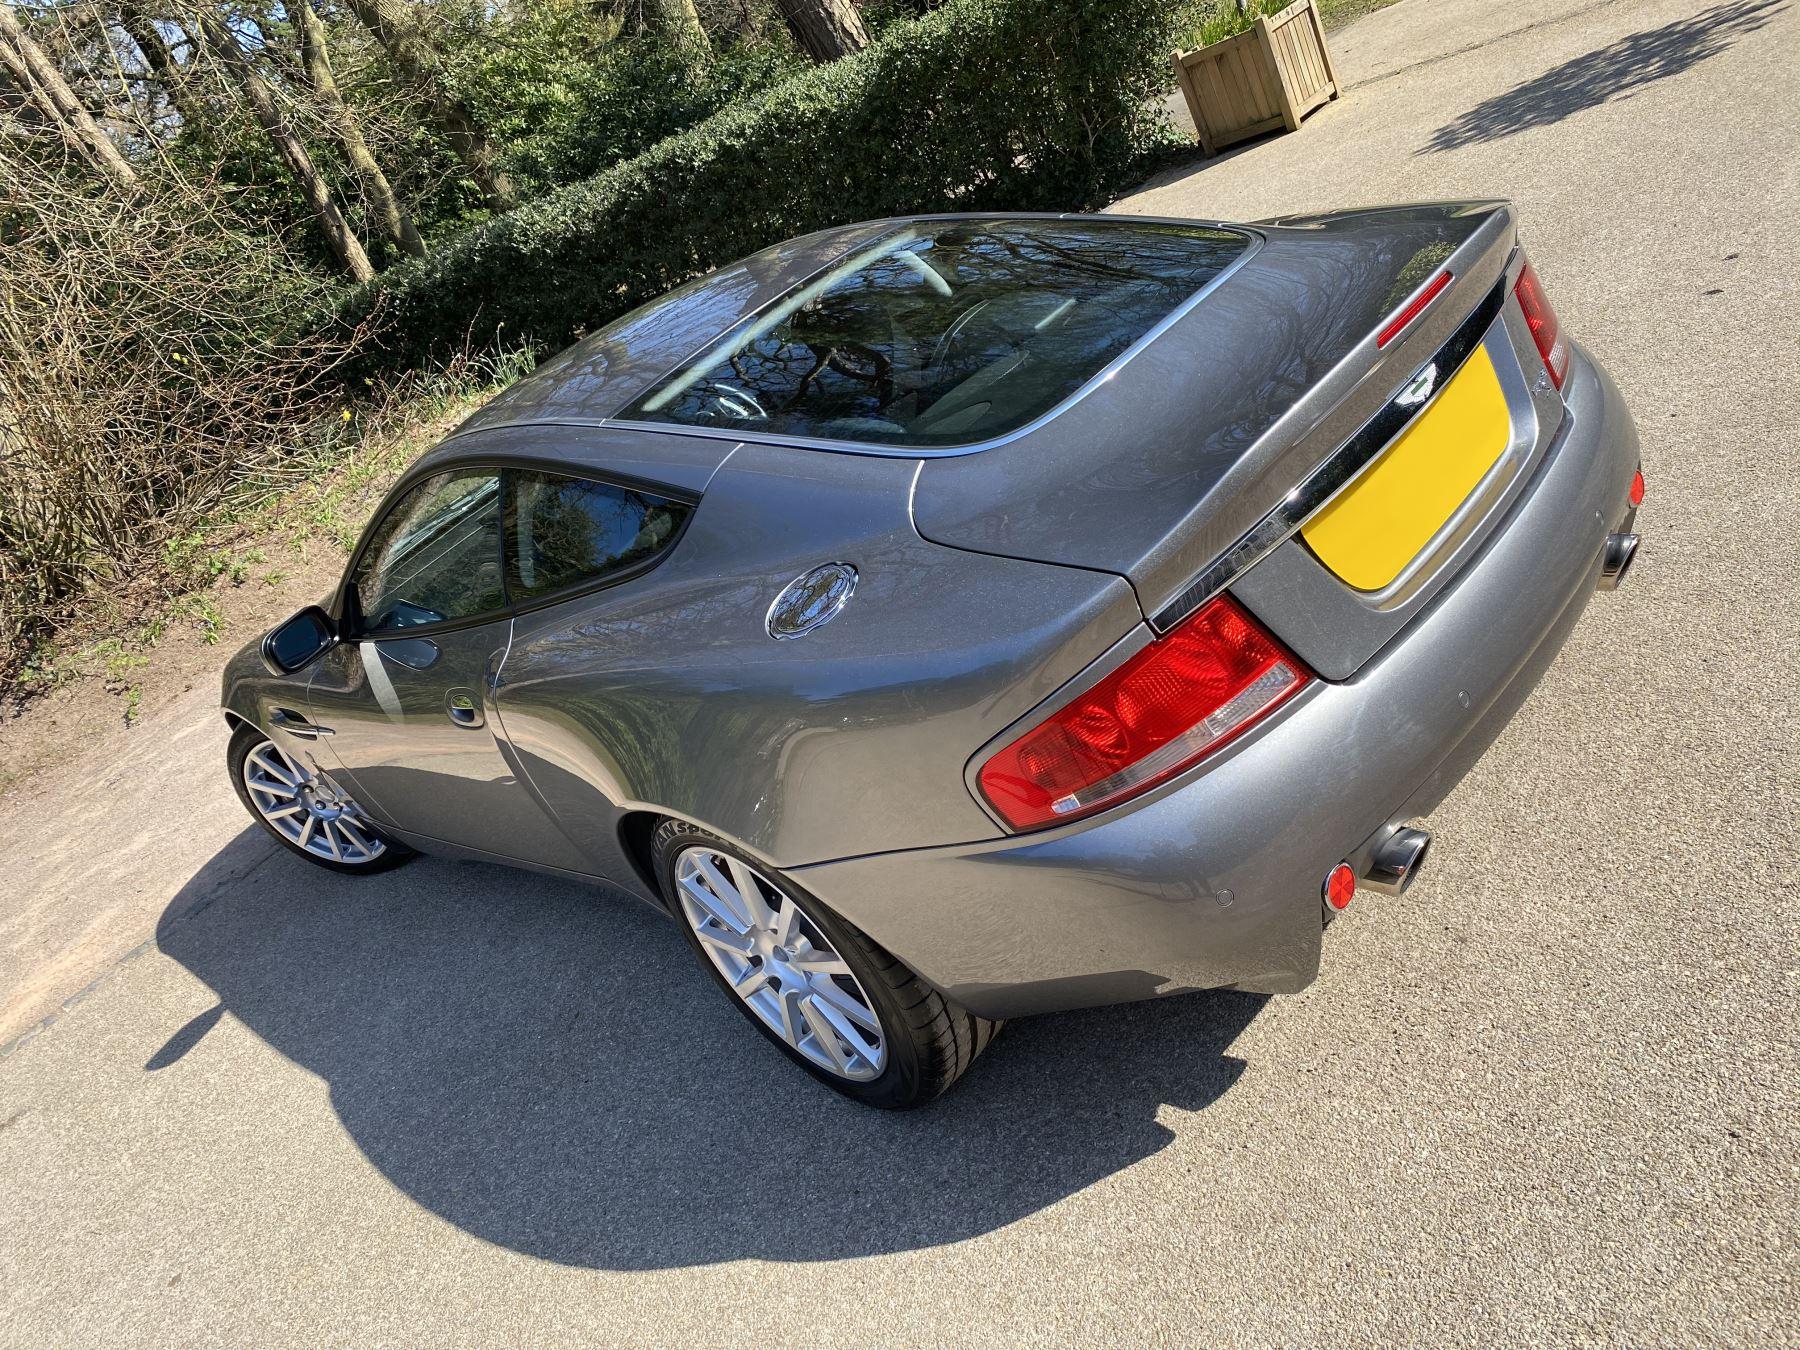 Aston Martin Vanquish S S V12 2+2 2dr image 9